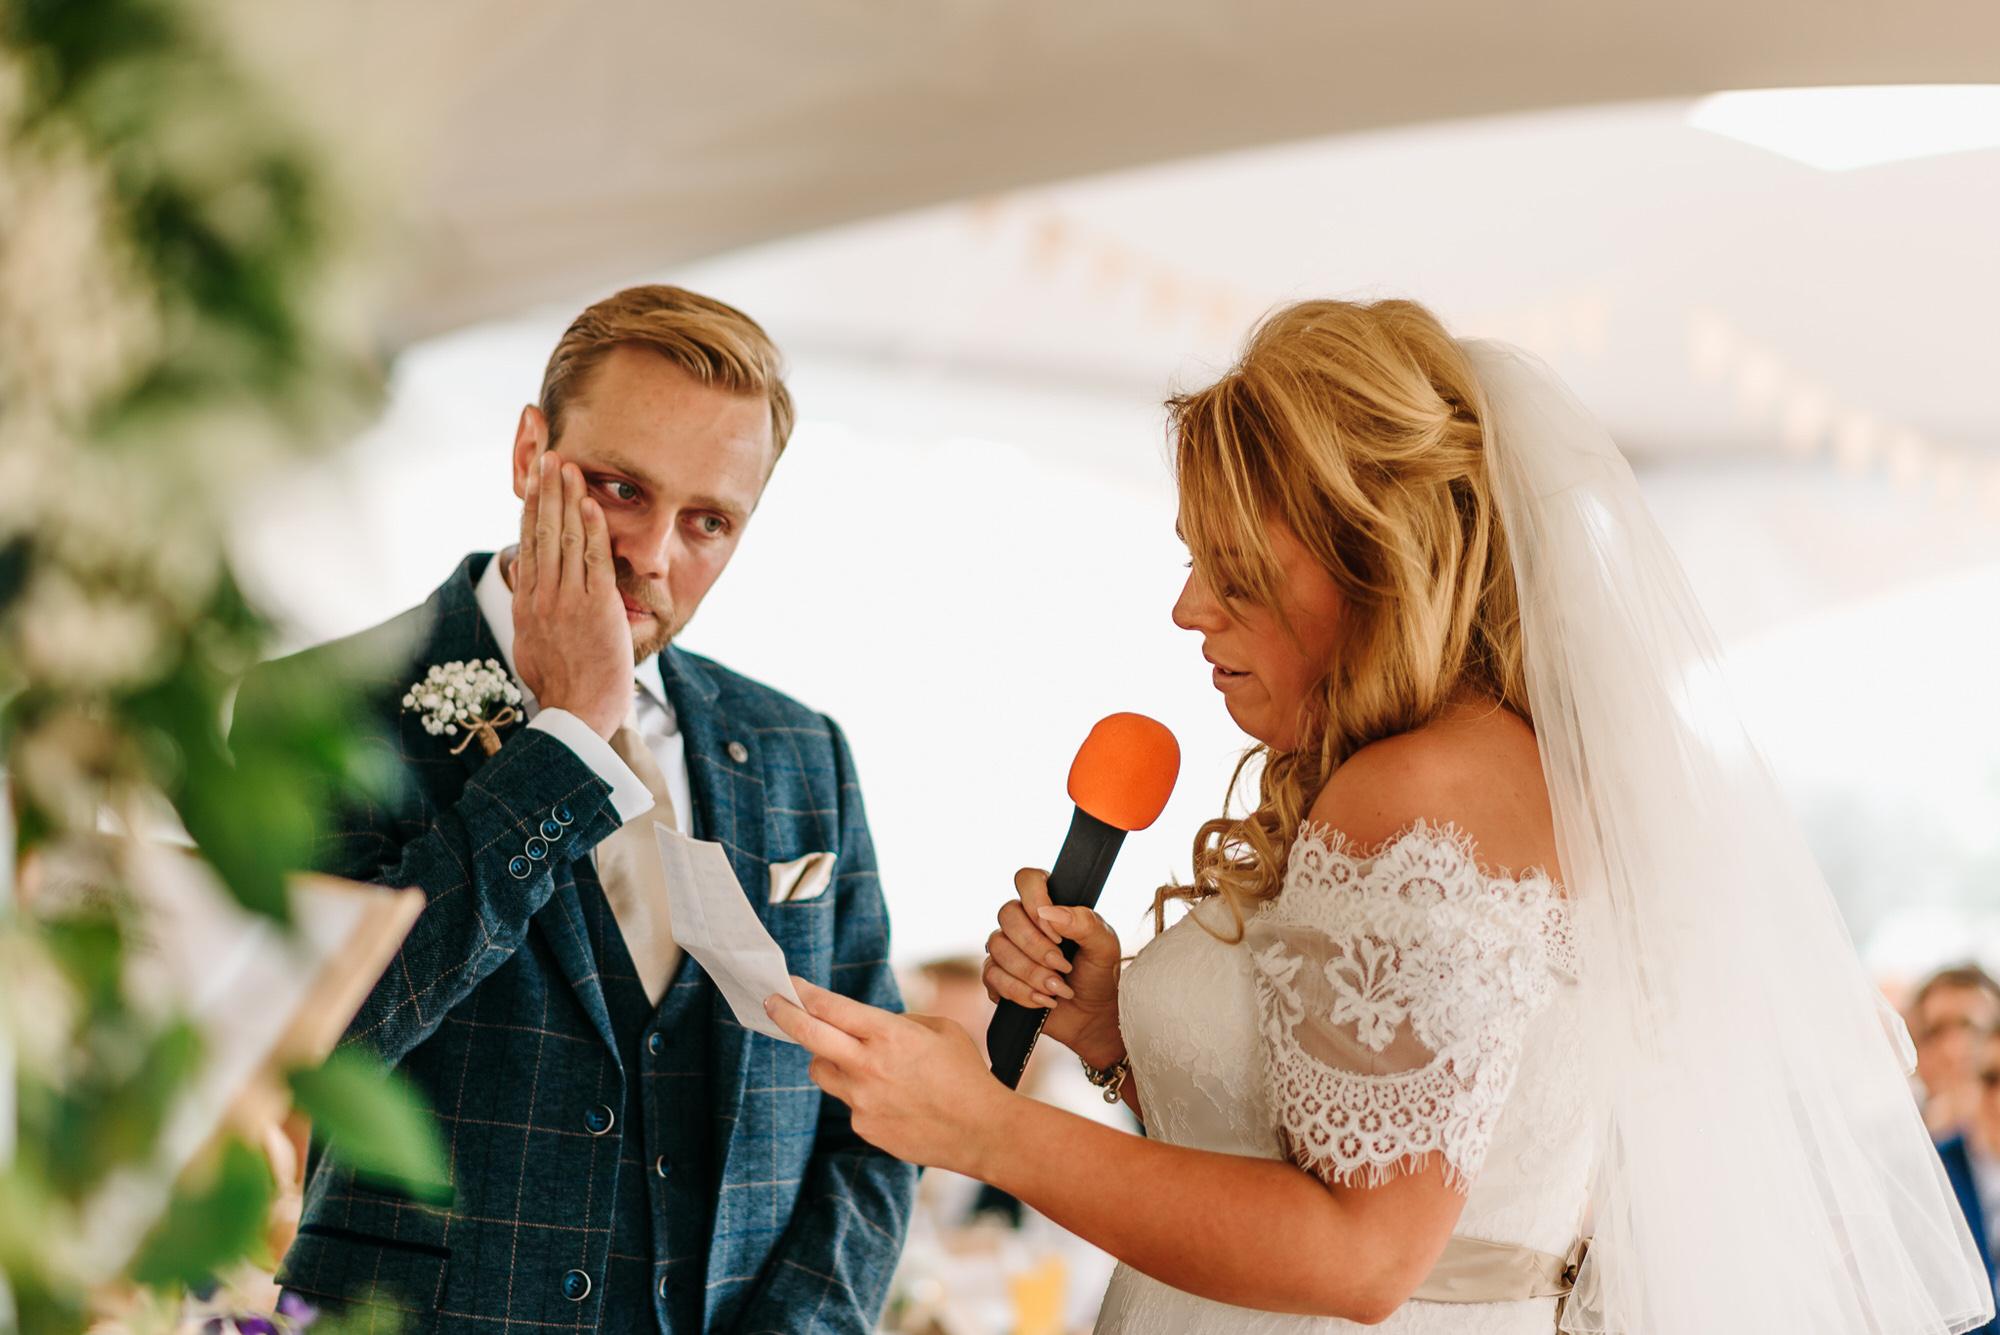 Best Of Yorkshire Wedding Photography 2017 - Martyn Hand-54.jpg